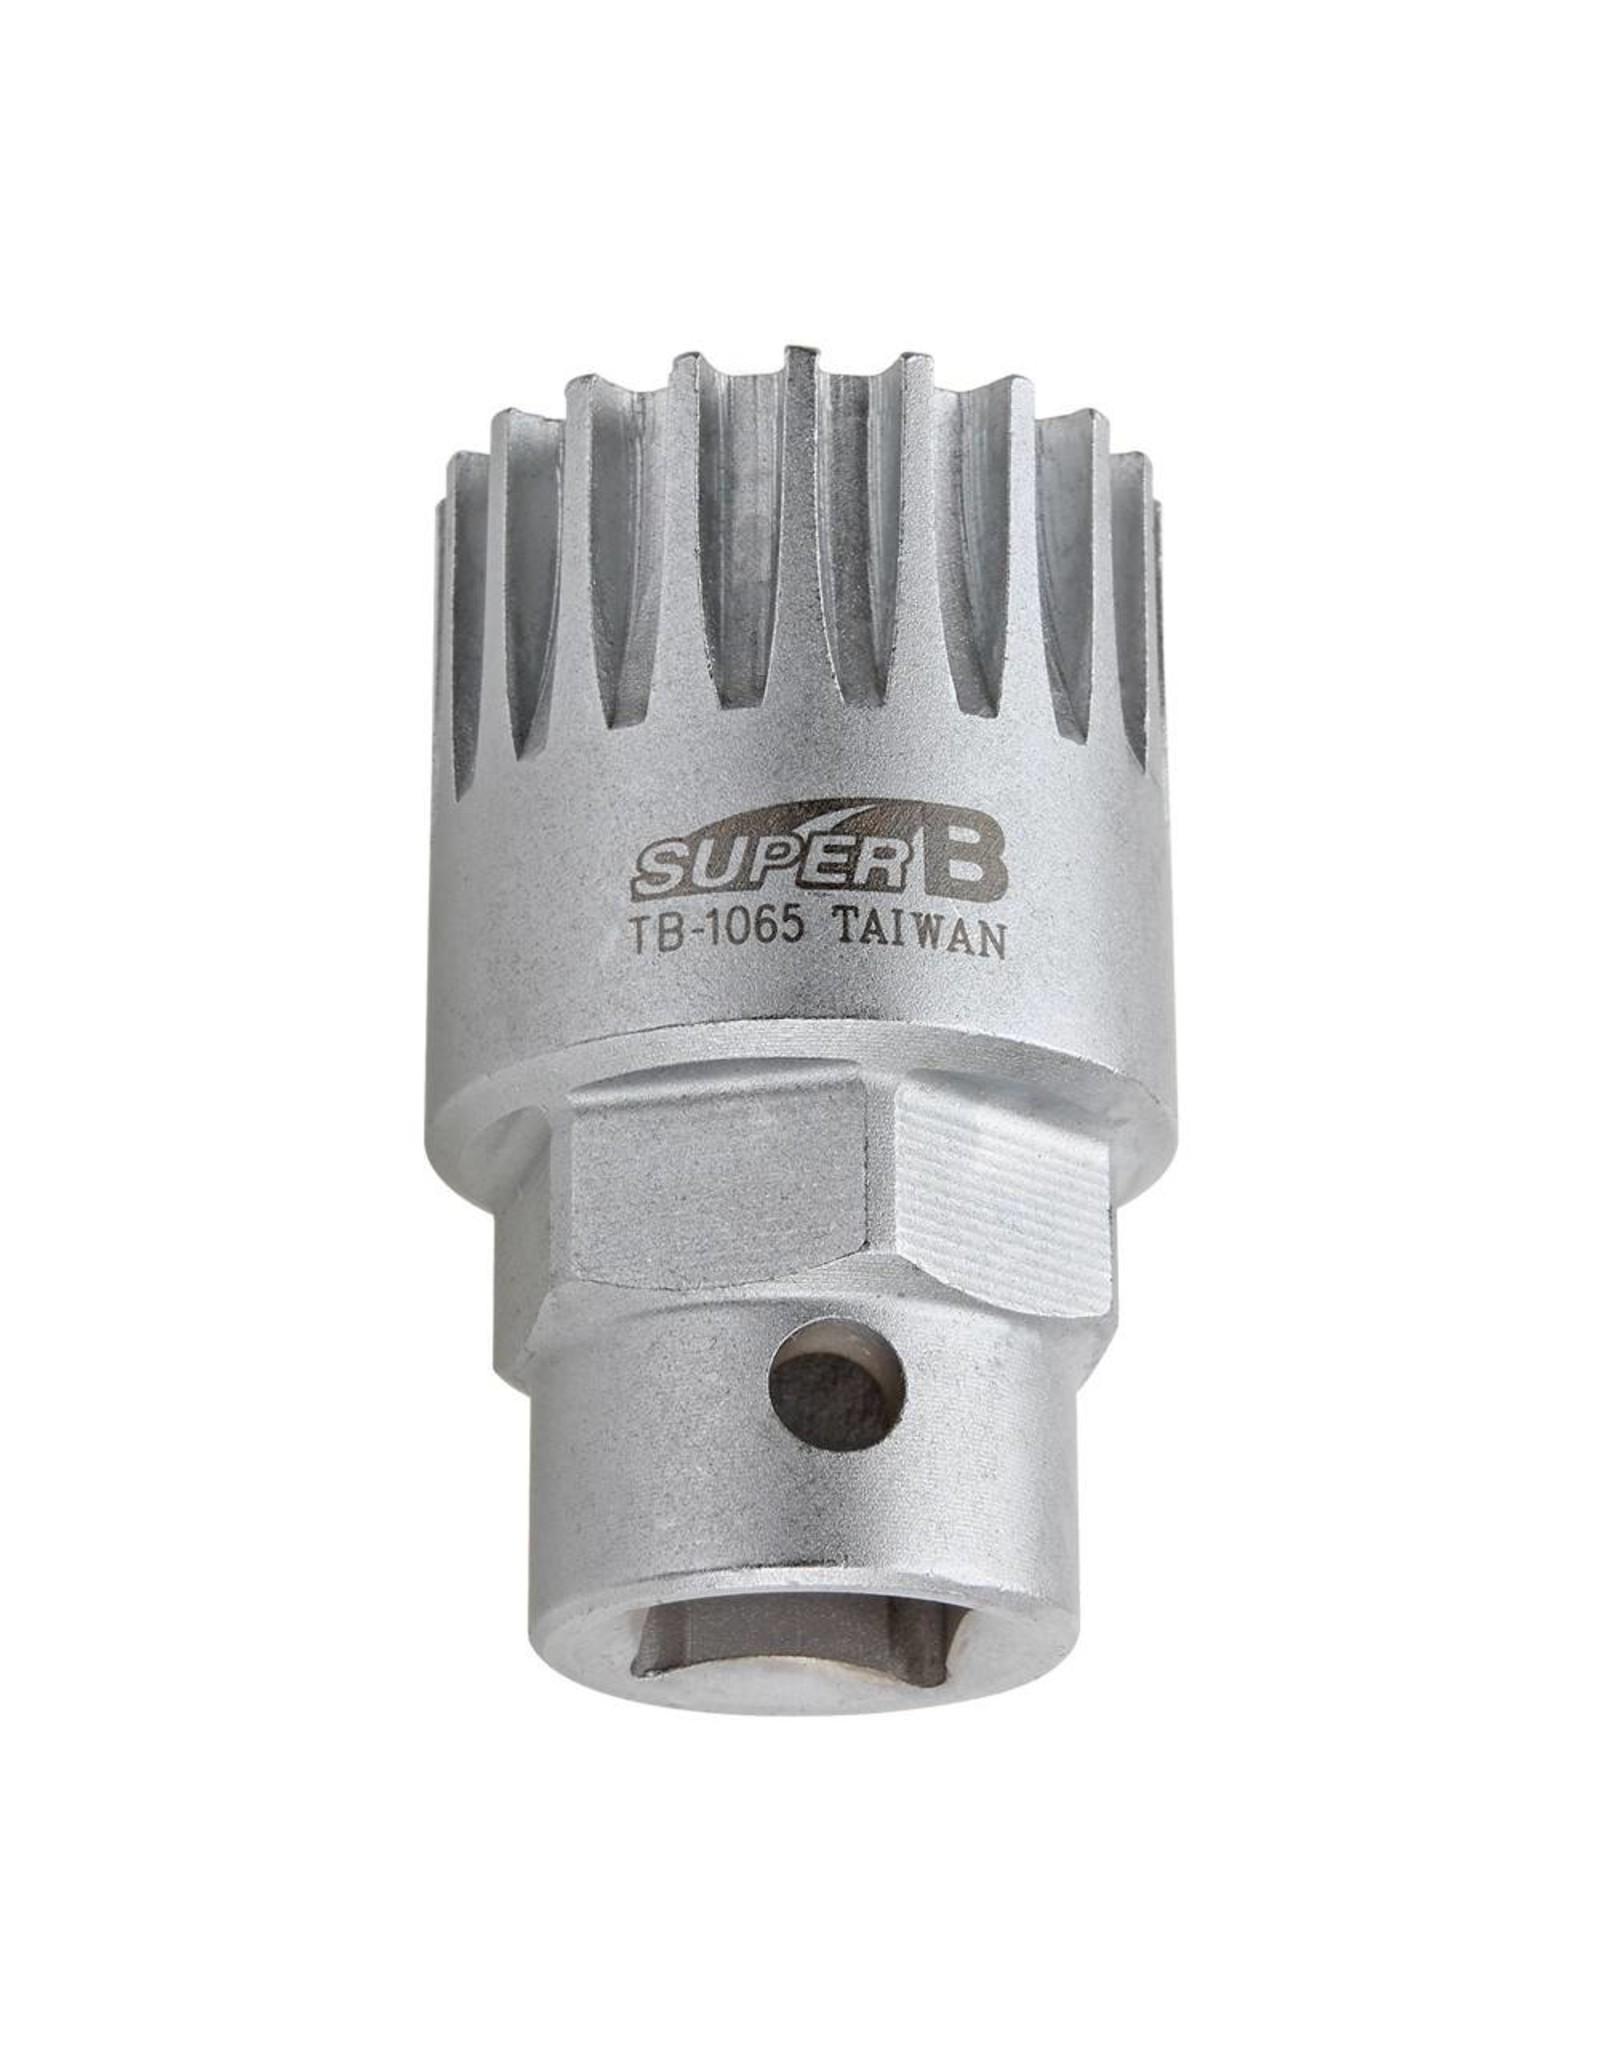 SUPER B Super B Bottom Bracket Tool - 1065 Cartridge